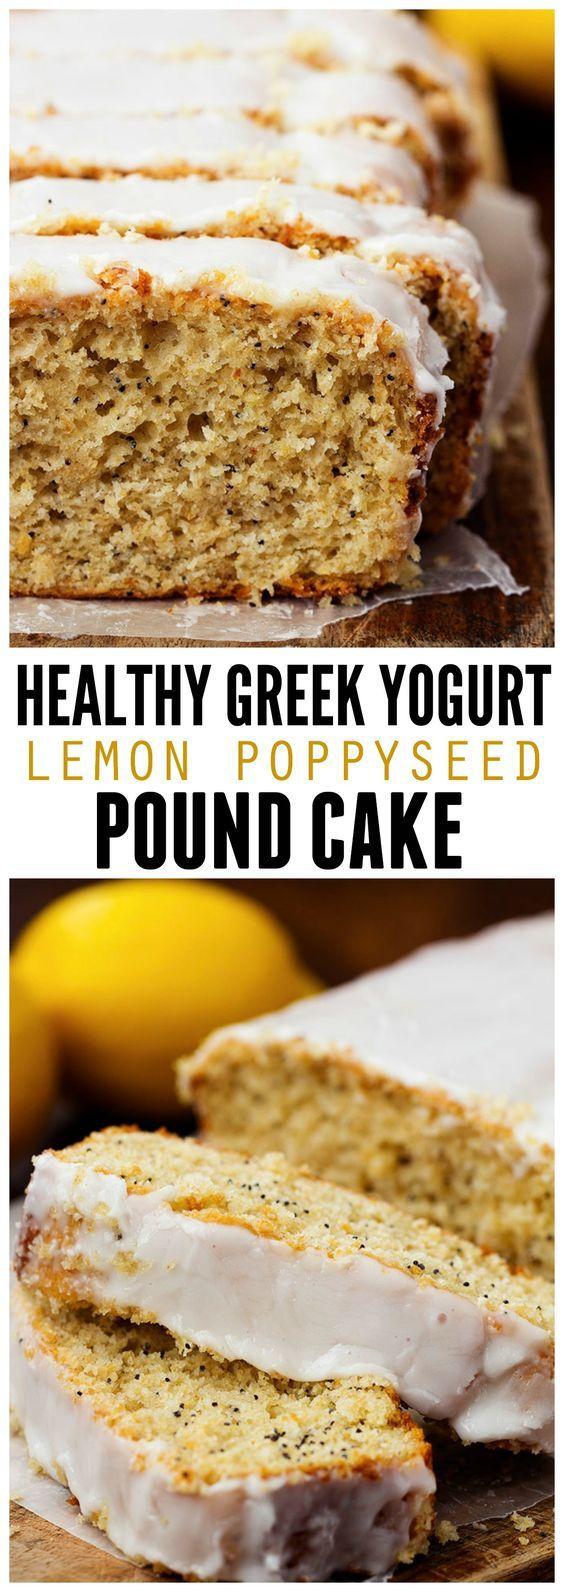 Healthy Greek Yogurt Lemon Poppyseed Pound Cake | Food And Cake Recipes